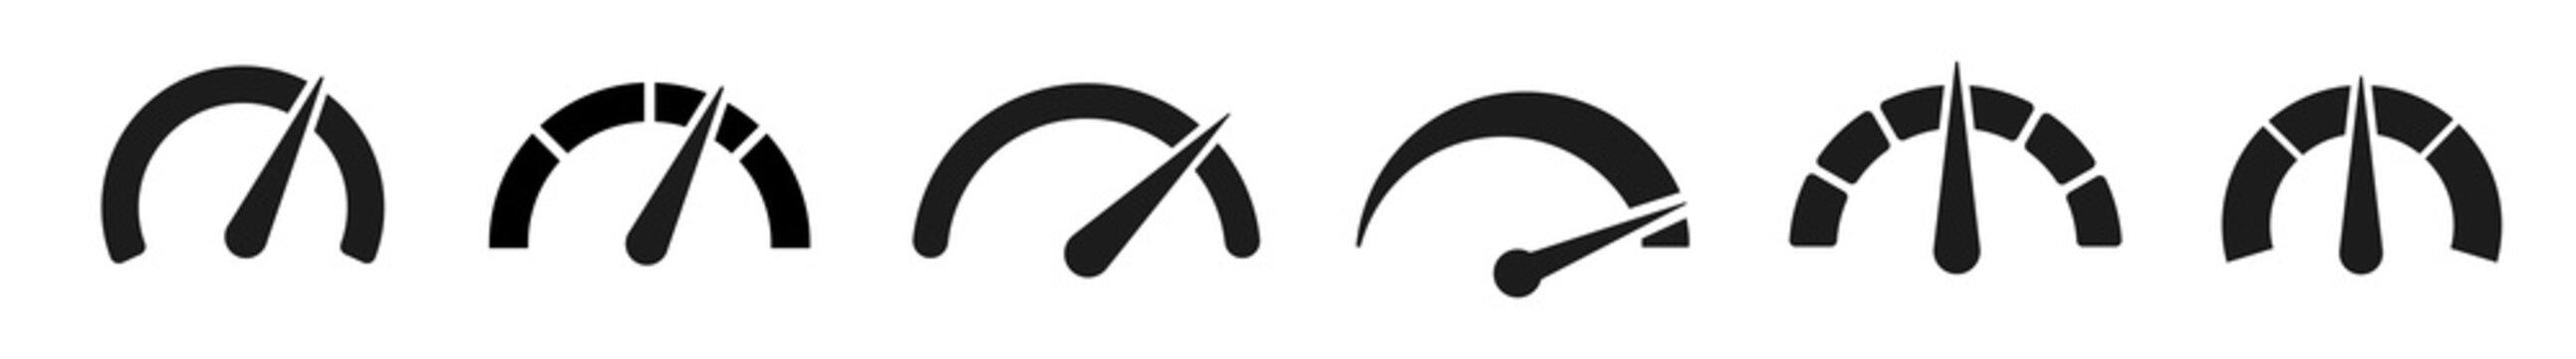 Speedometers set icons. Vector illustration